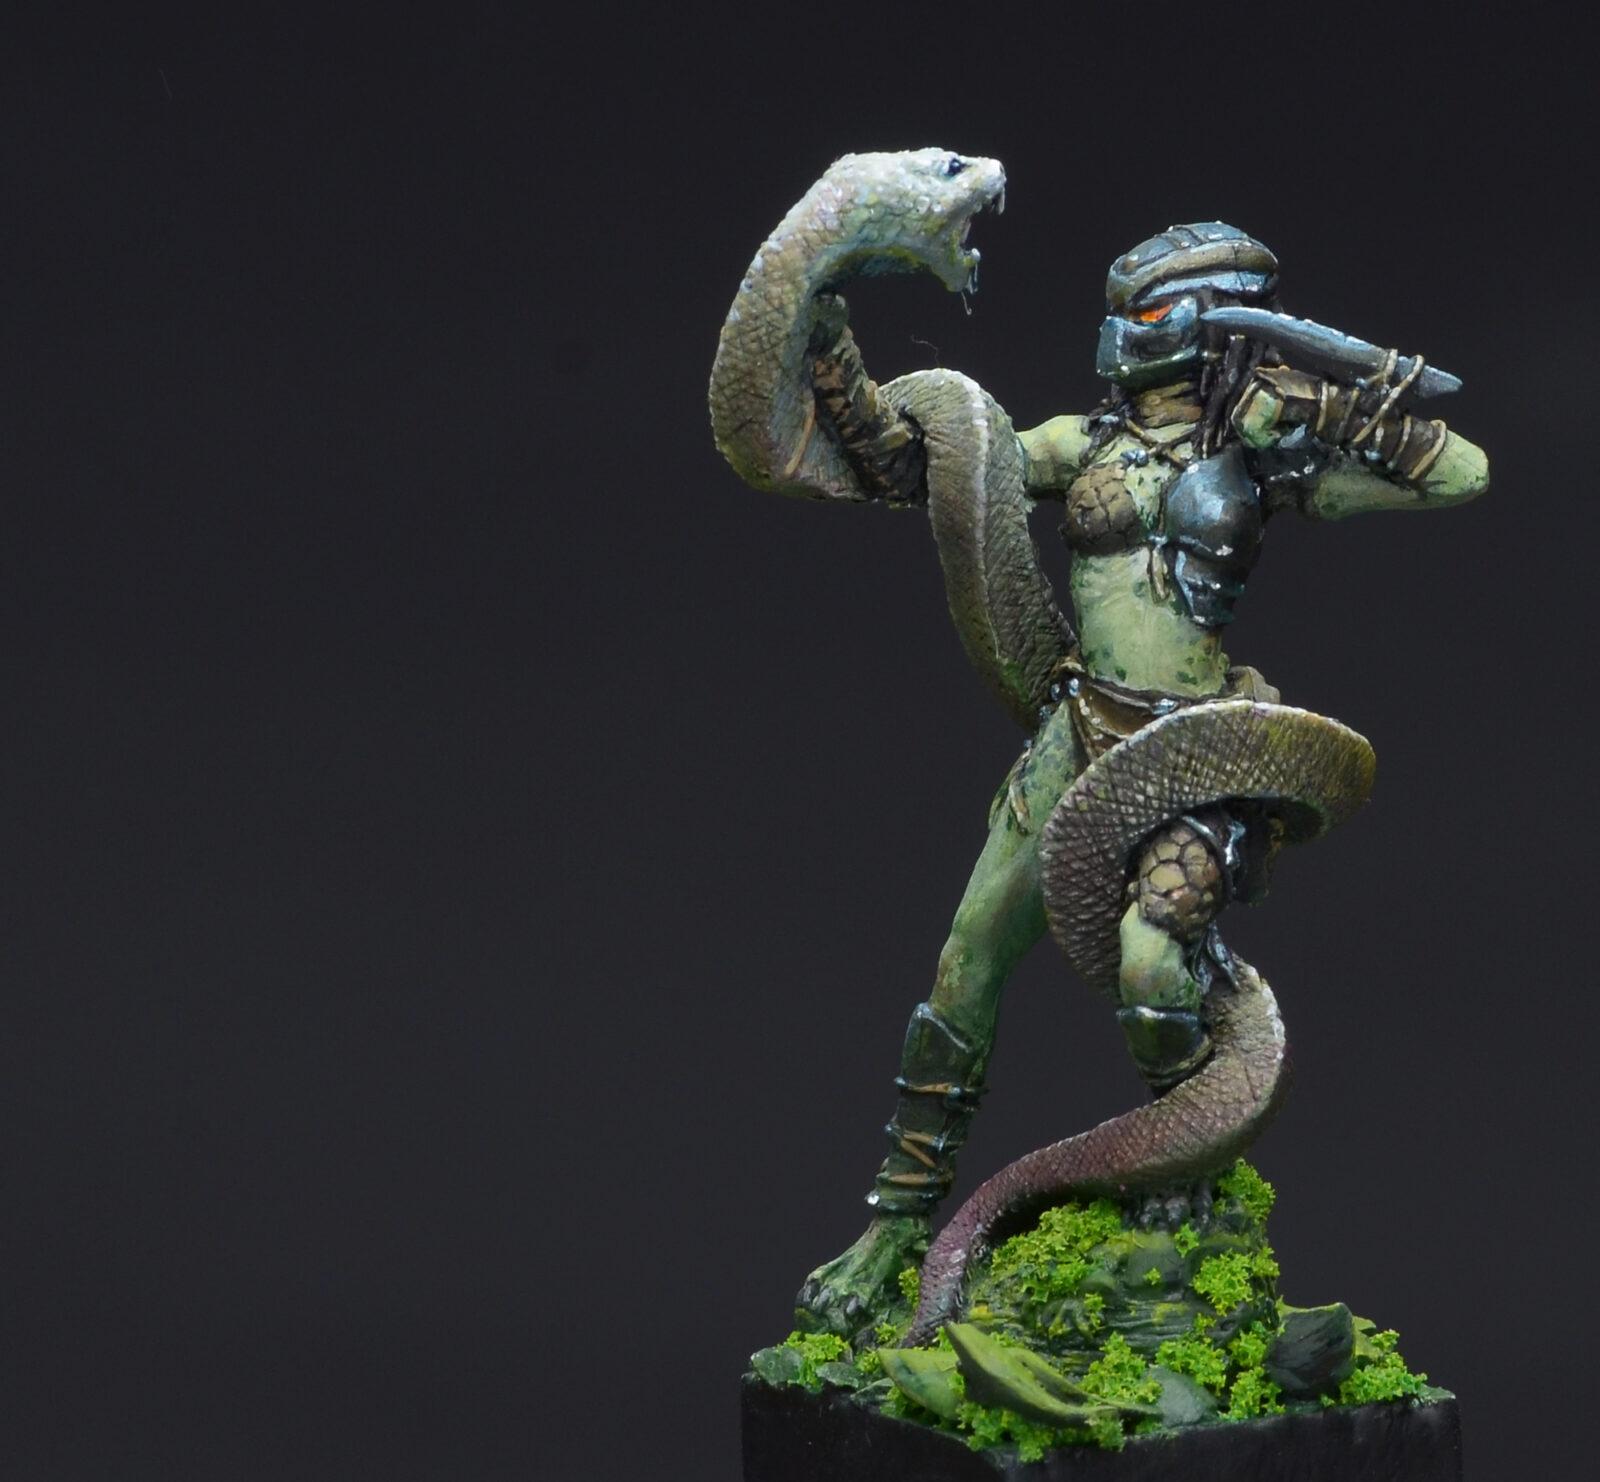 Predator07